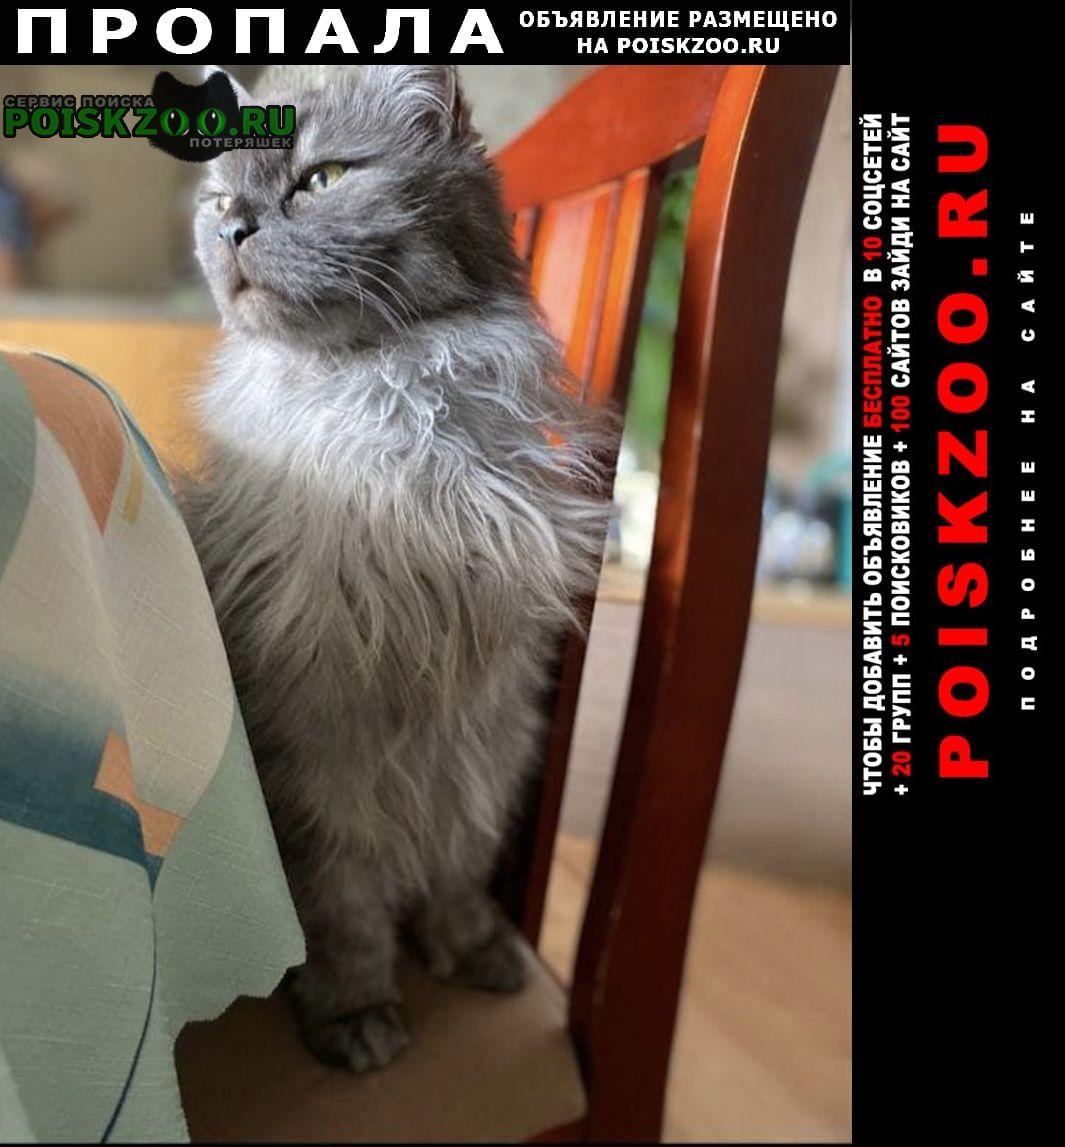 Пропал кот серый -британец Санкт-Петербург